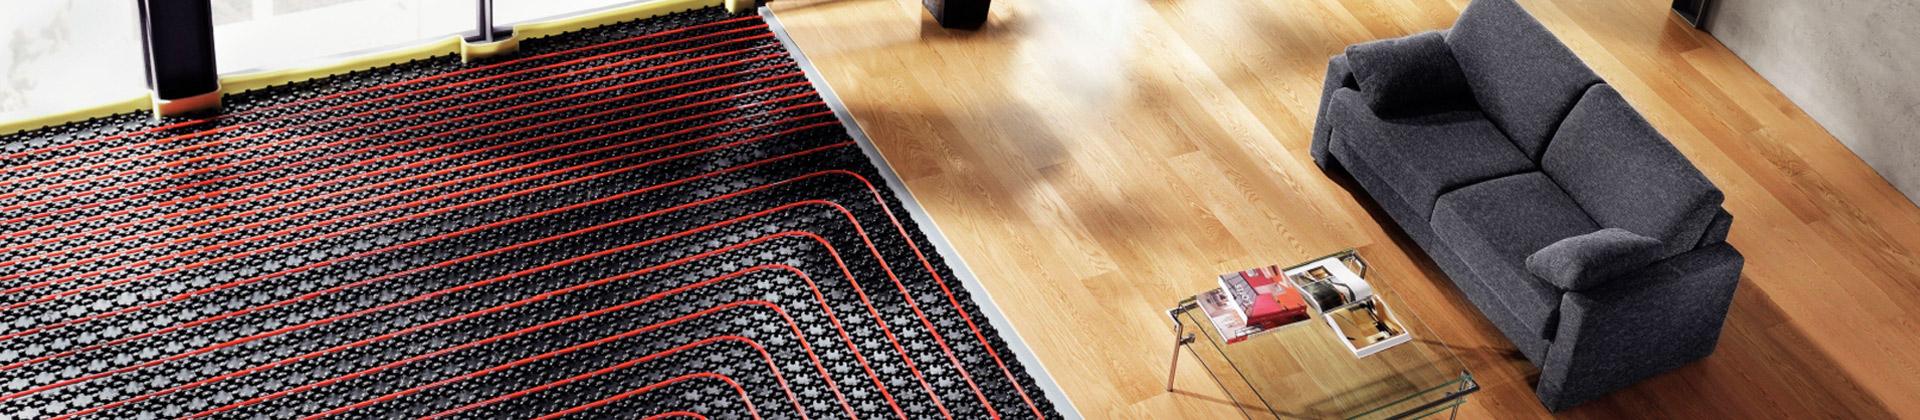 Underfloor Heating Floor Detail